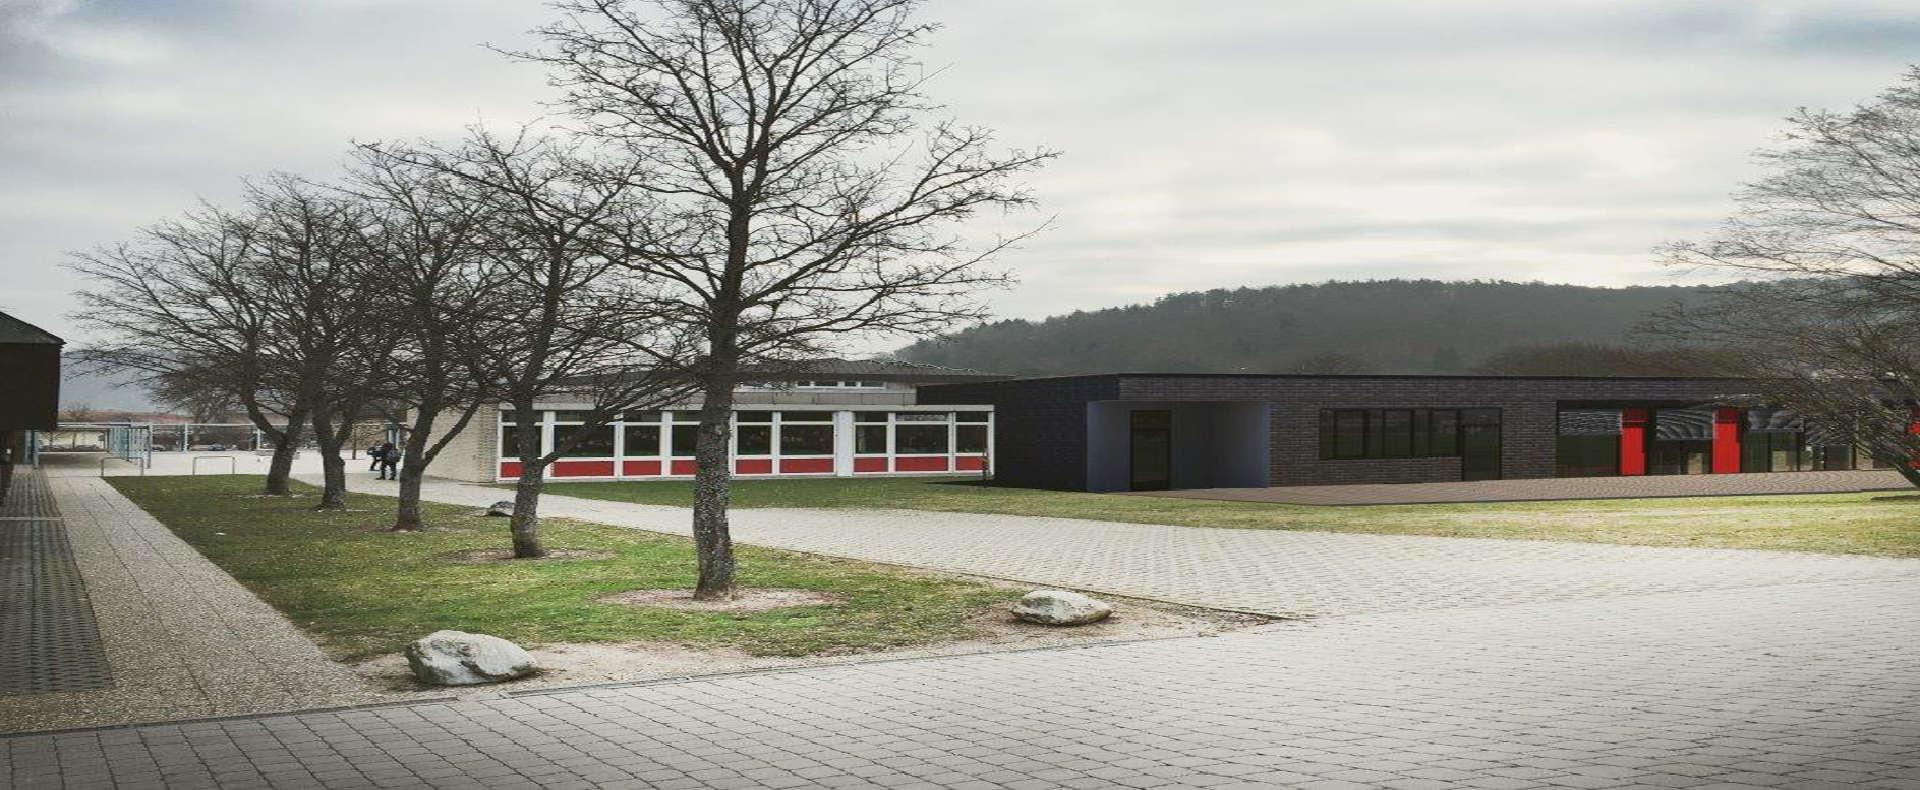 Wettbewerb Joachim-Schäfer Schule Rangendingen, 2016